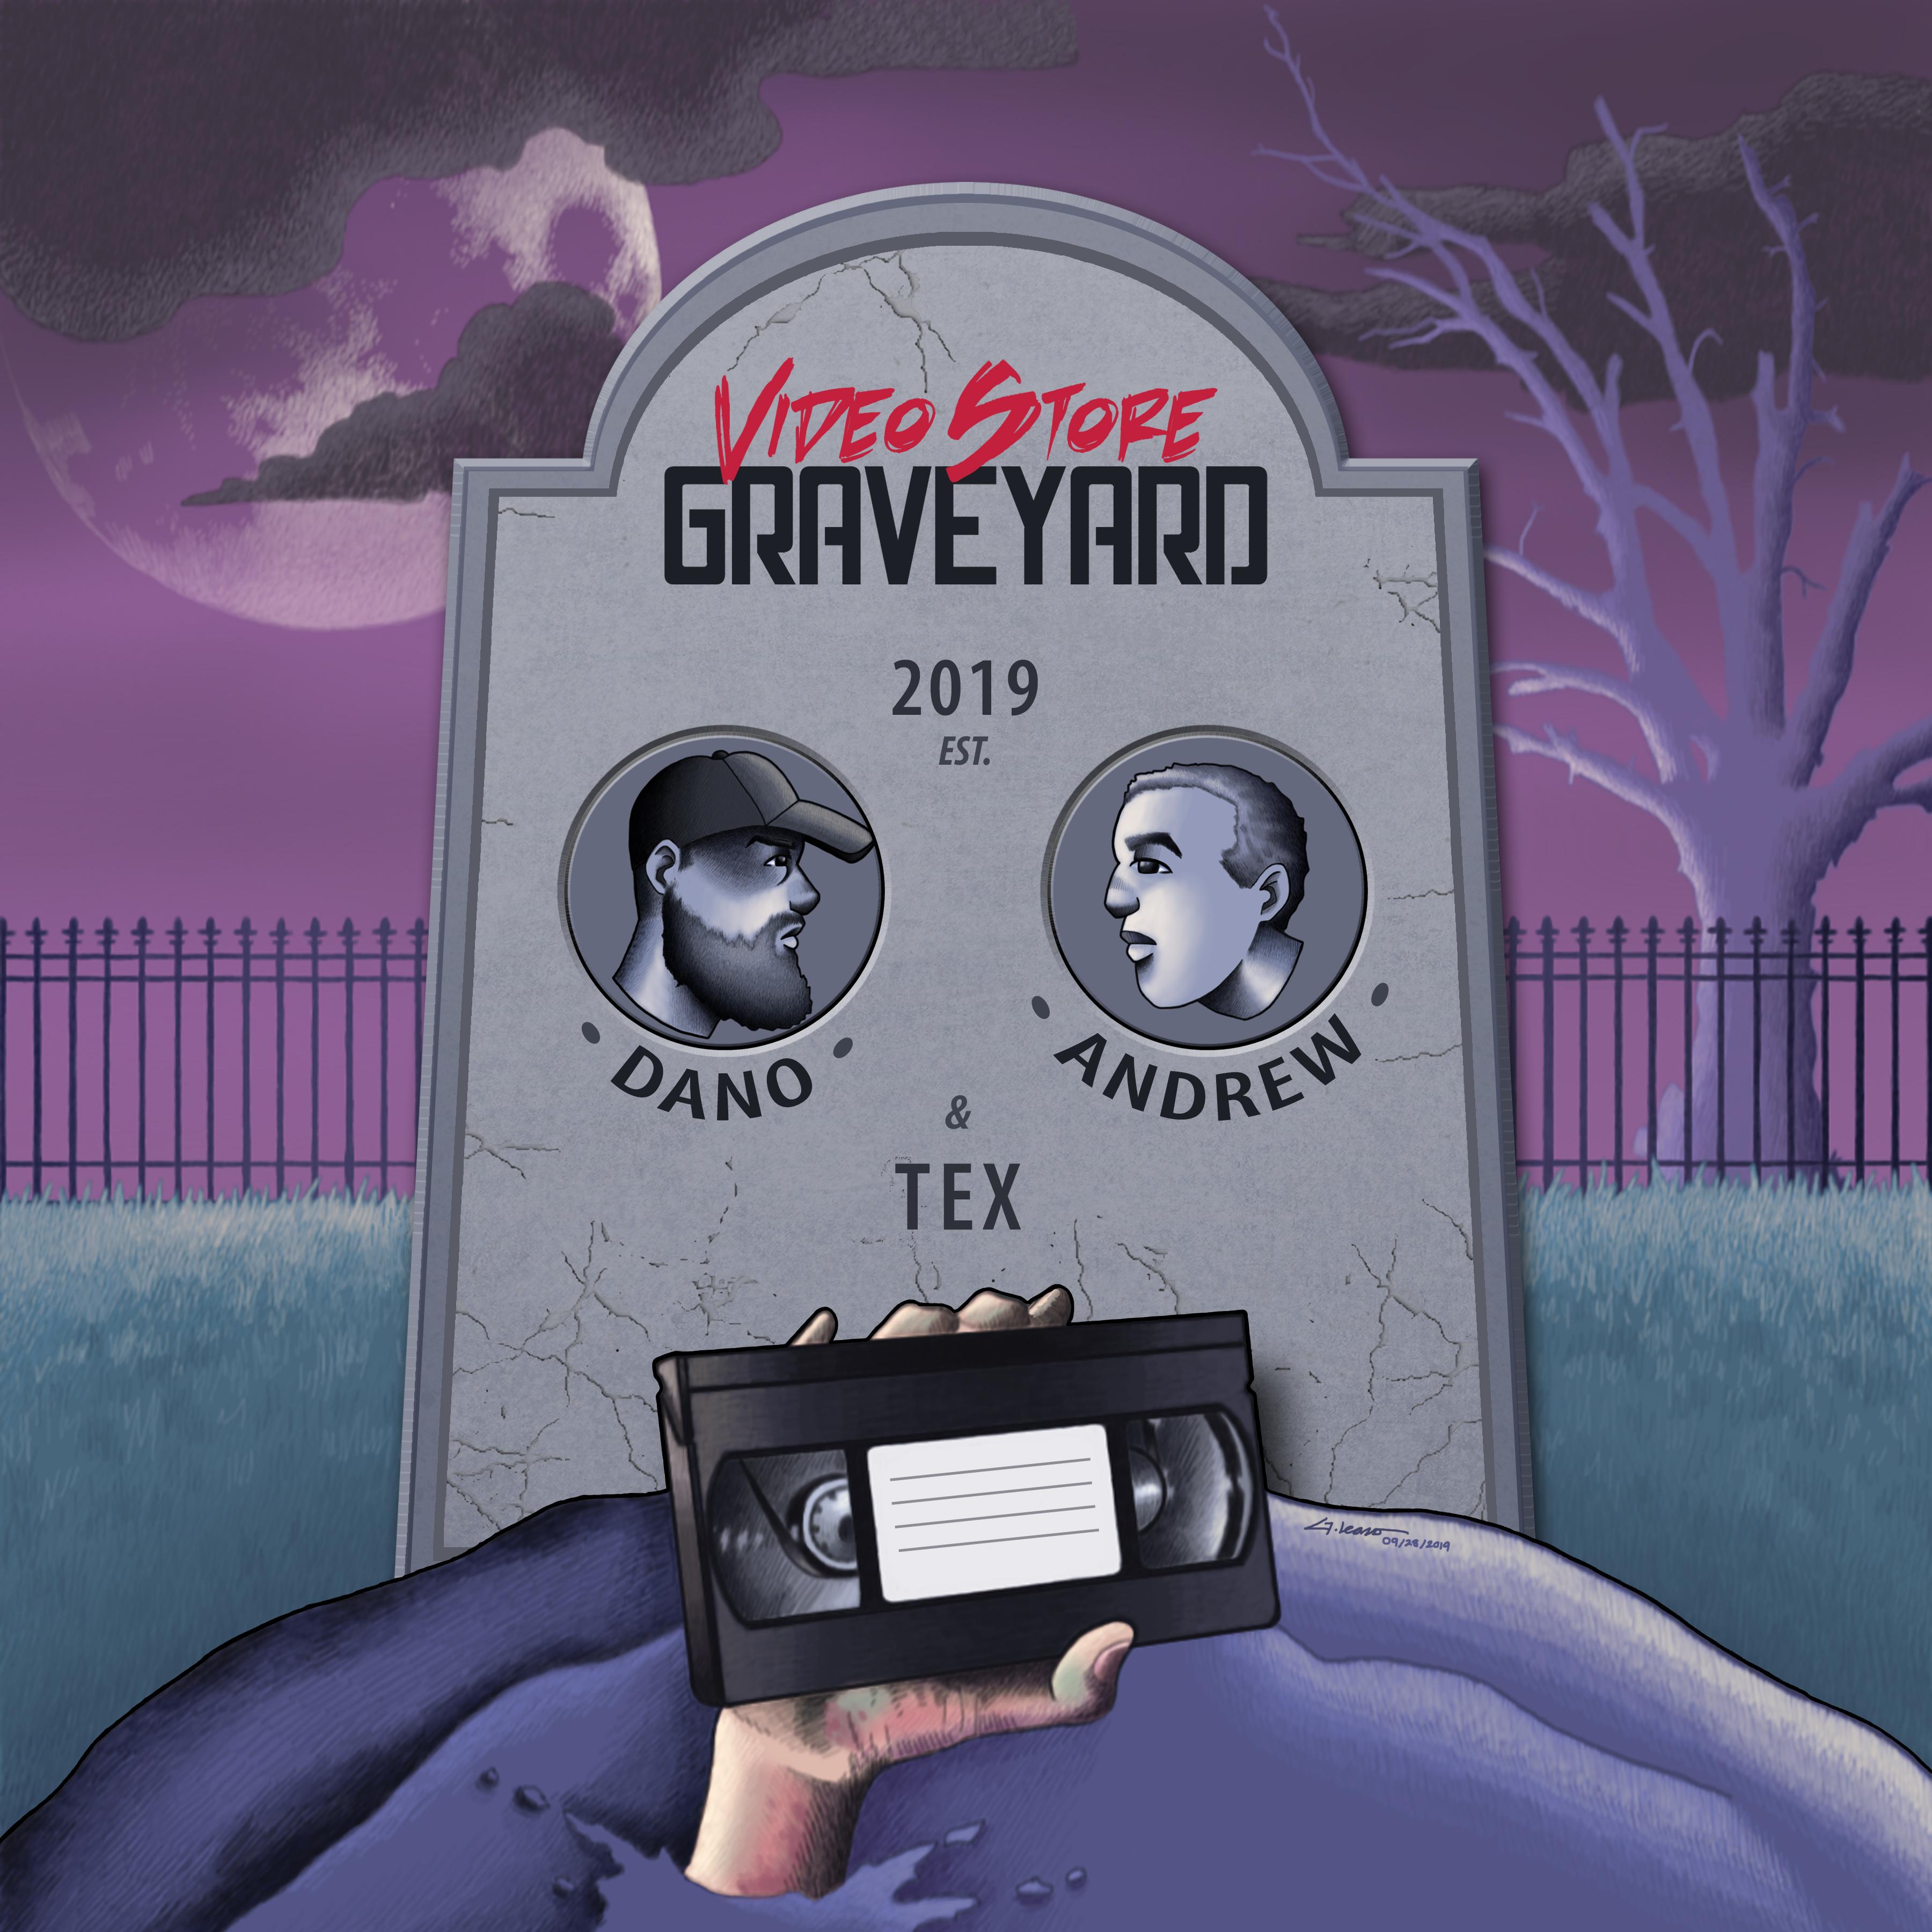 Video Store Graveyard